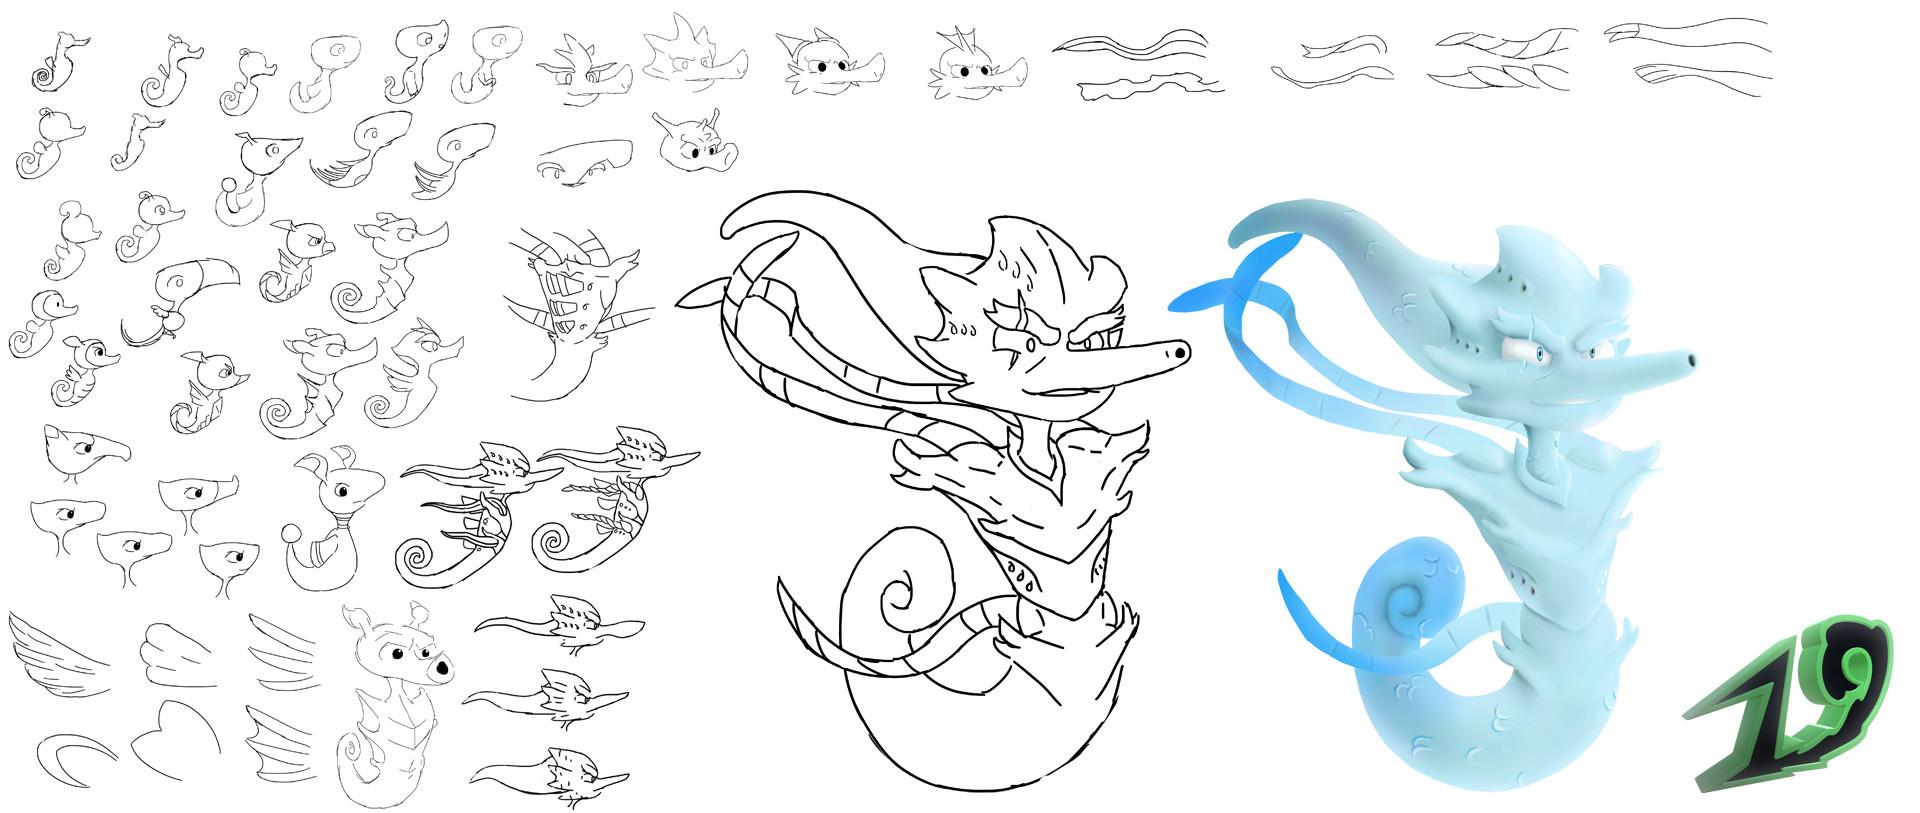 Matthew ramirez concept sketches fred 001